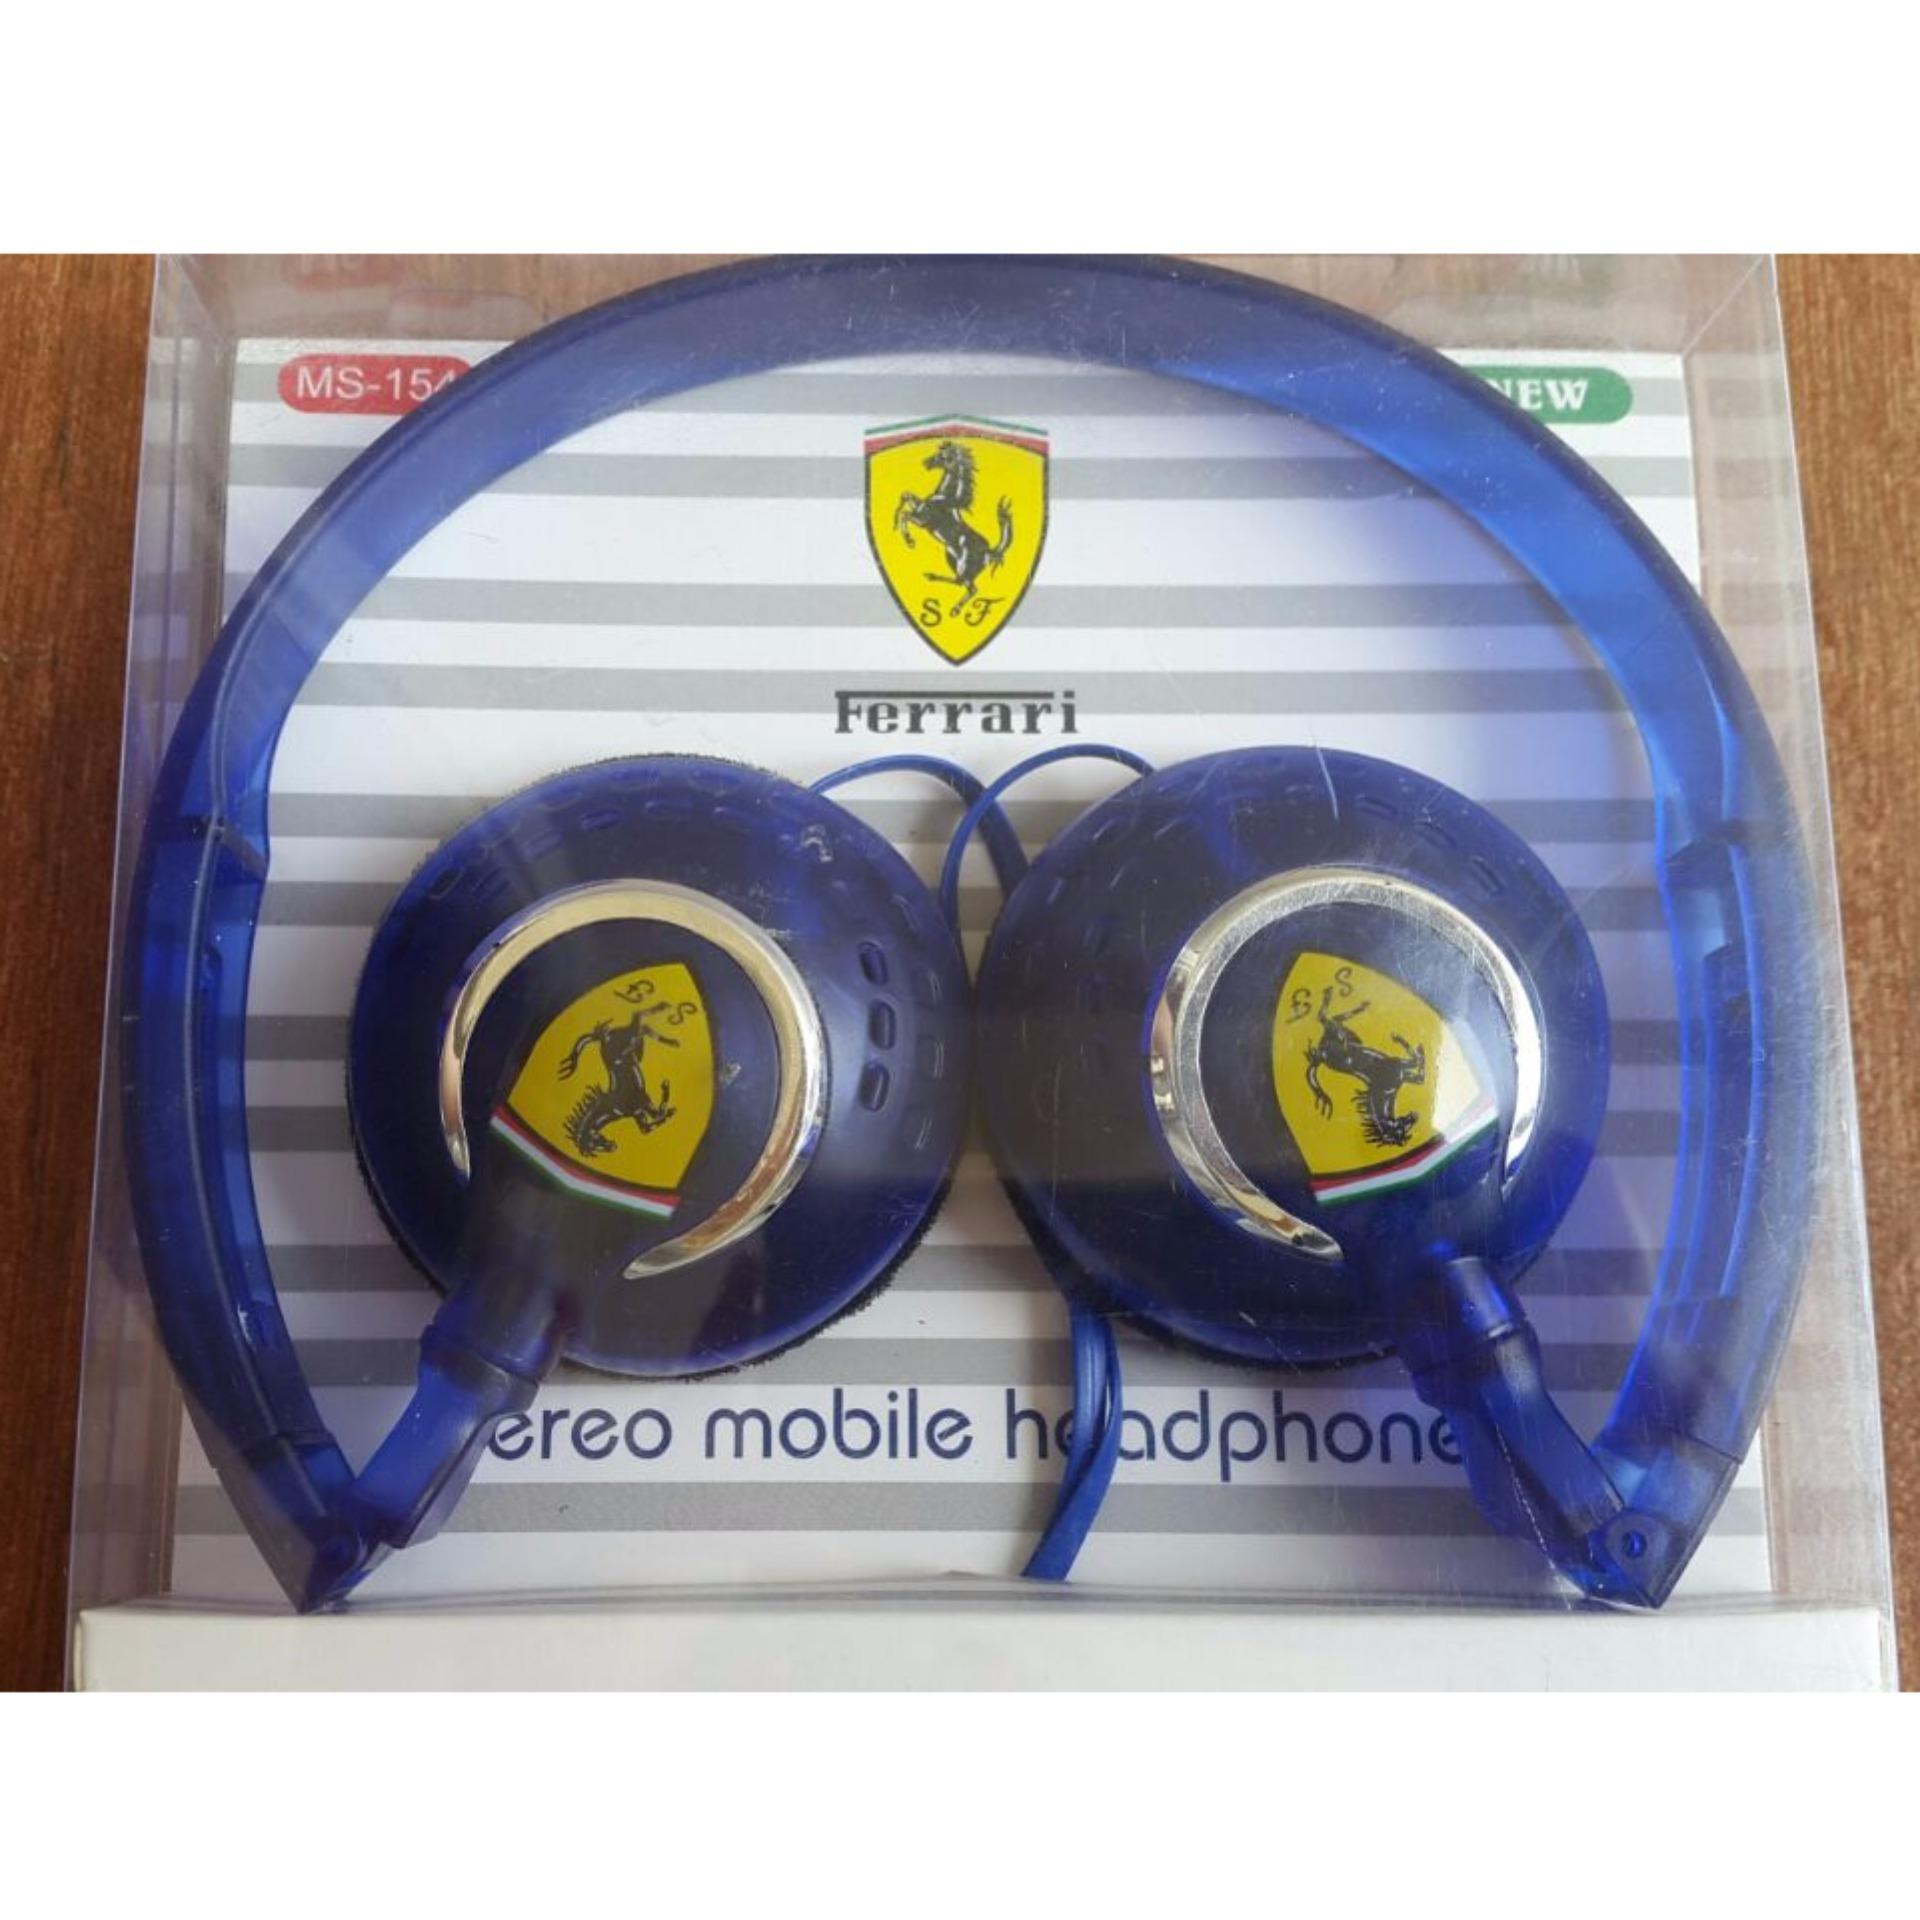 Best Ferrari Fashionable Stereo Mobile 3 5 Mm On Ear Headphones Handsfree Samsung S8 Oem By Akg Headset Earphone Suara Bass 35 Warna